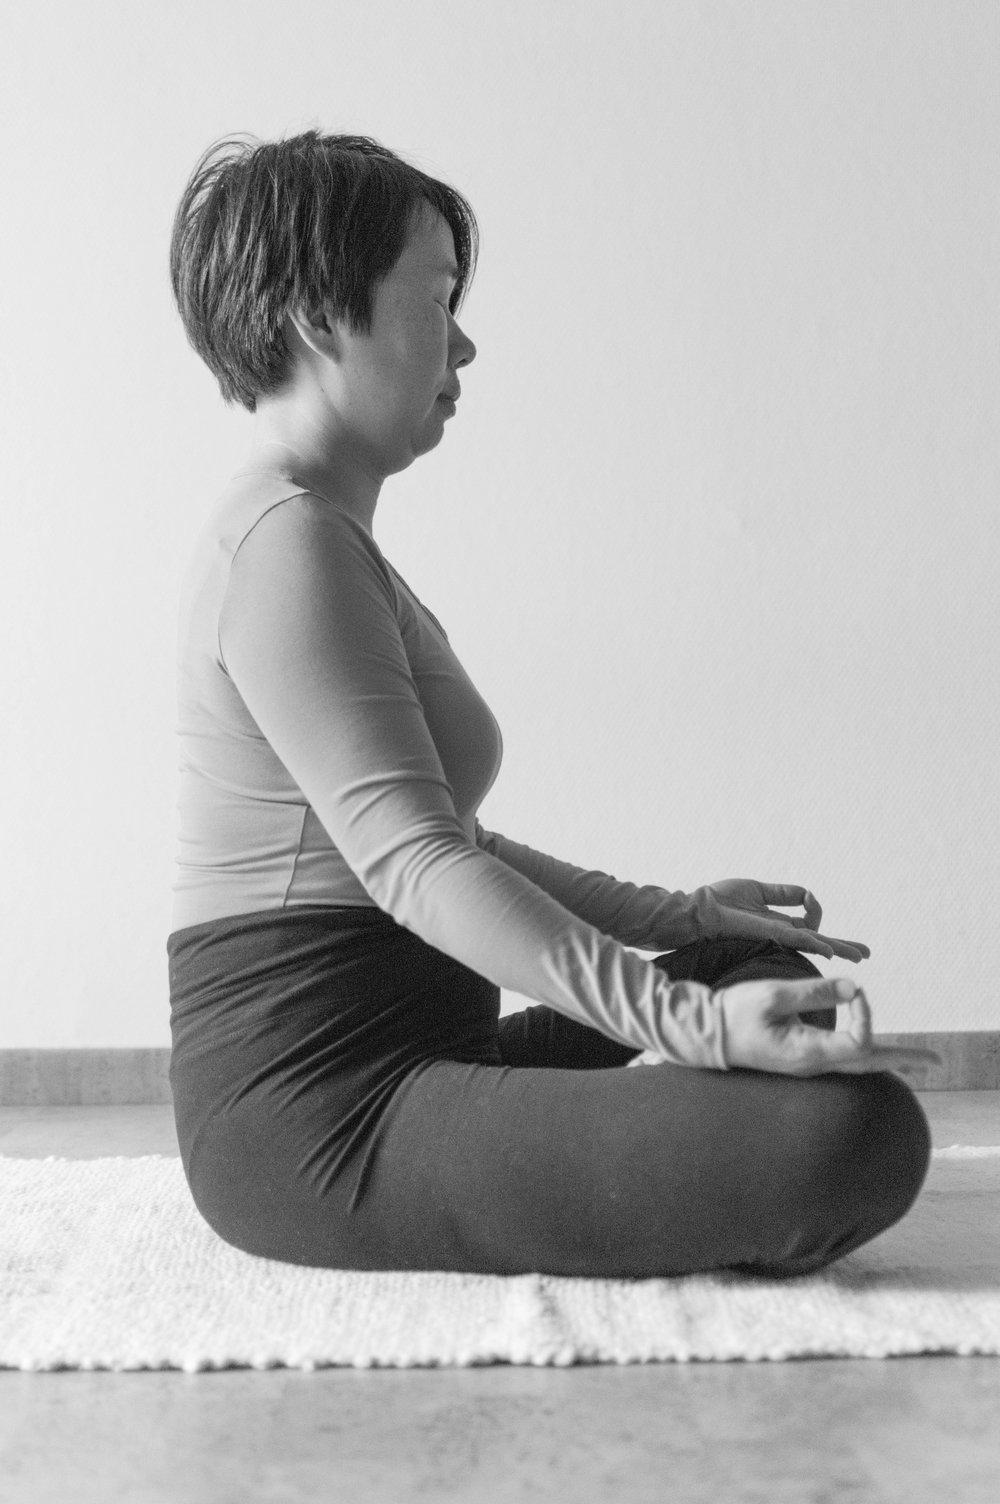 #meditatewithpete